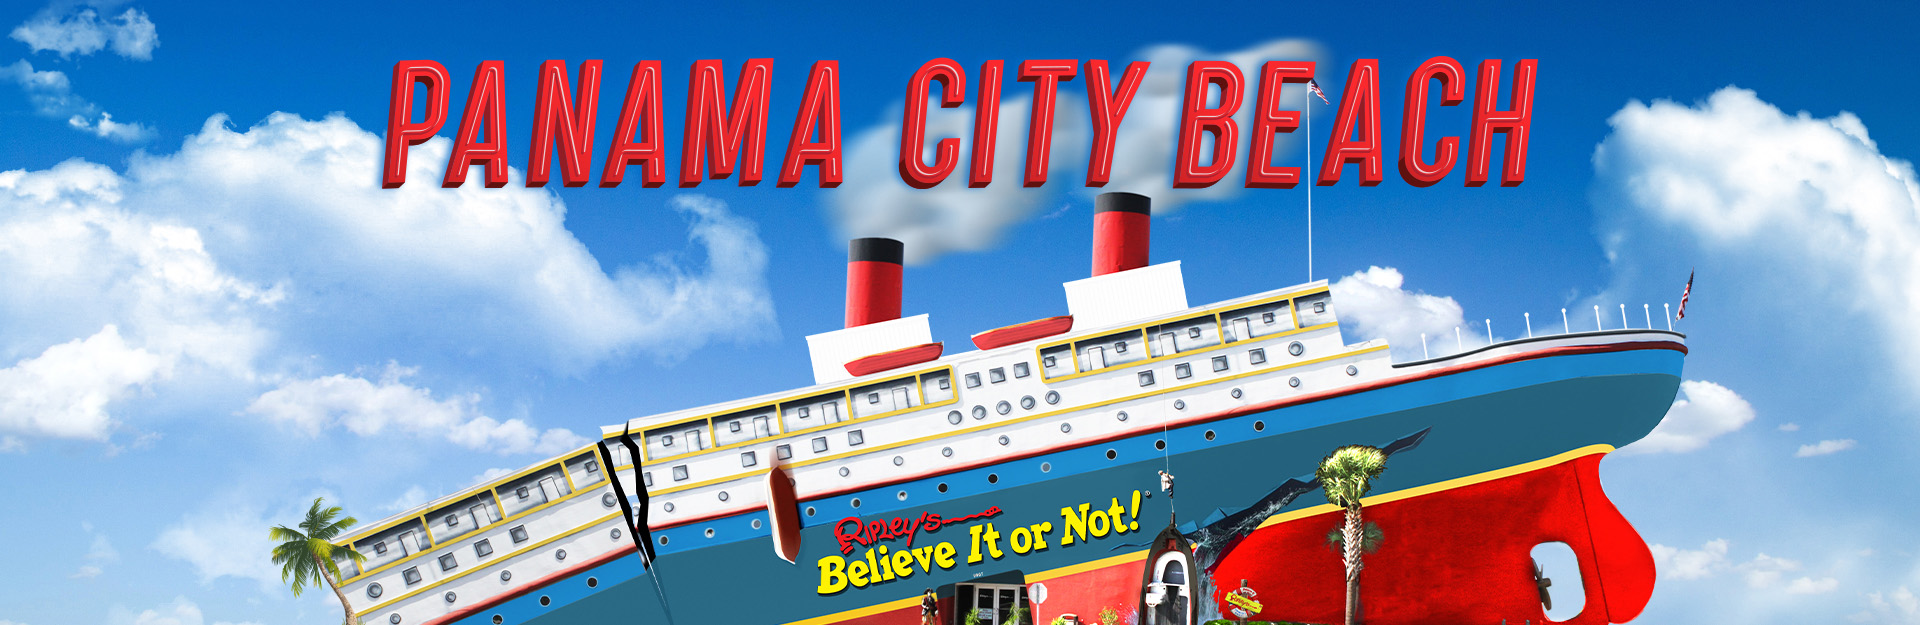 Ripley's Believe It or Not! Panama City Beach Hero Image